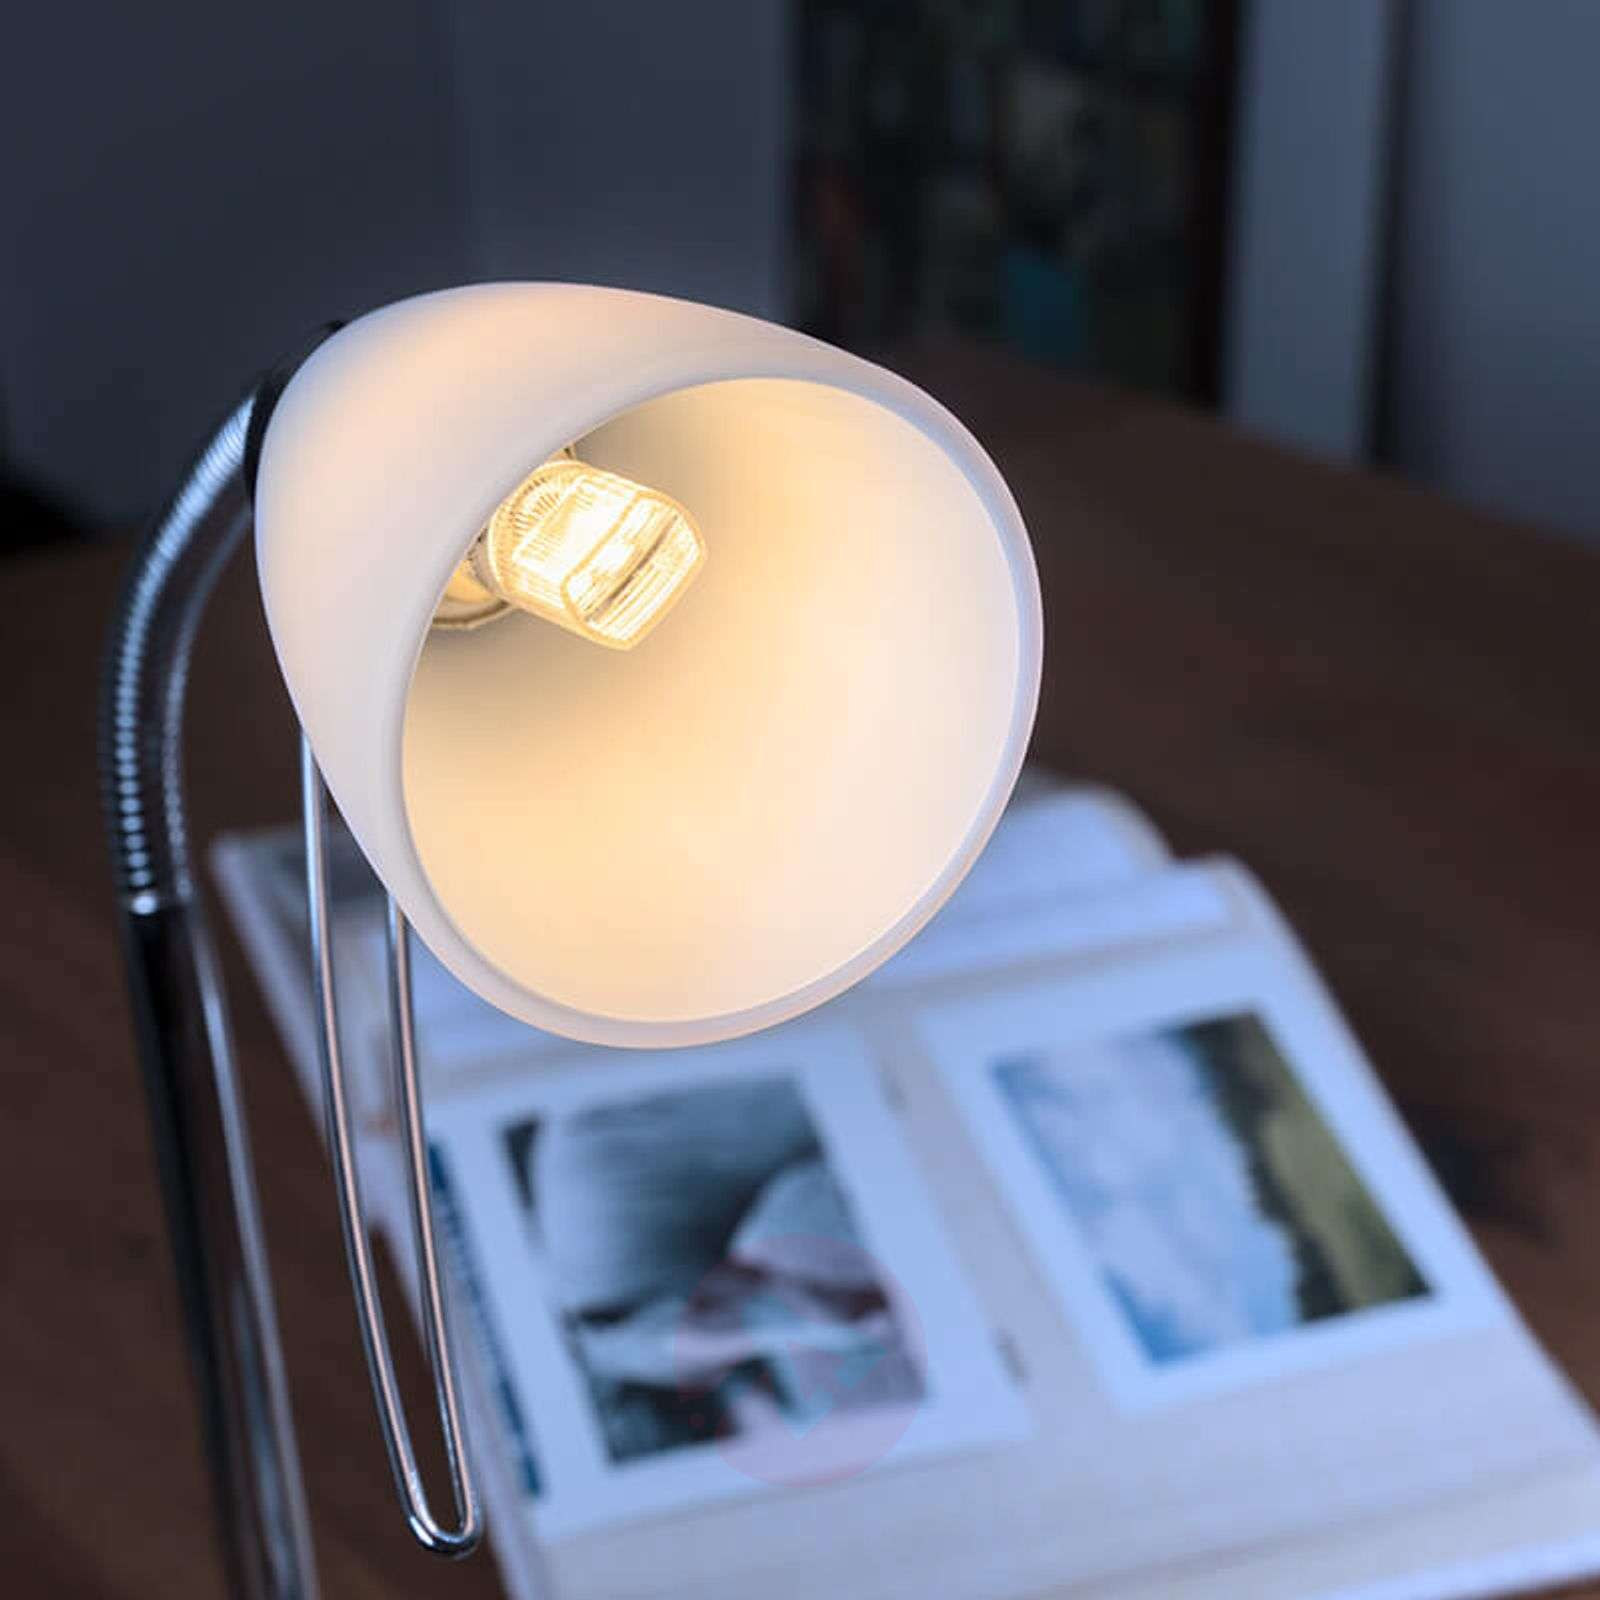 LED-kynälamppu G9 3,8 W, 470 lumenia-7262070X-01